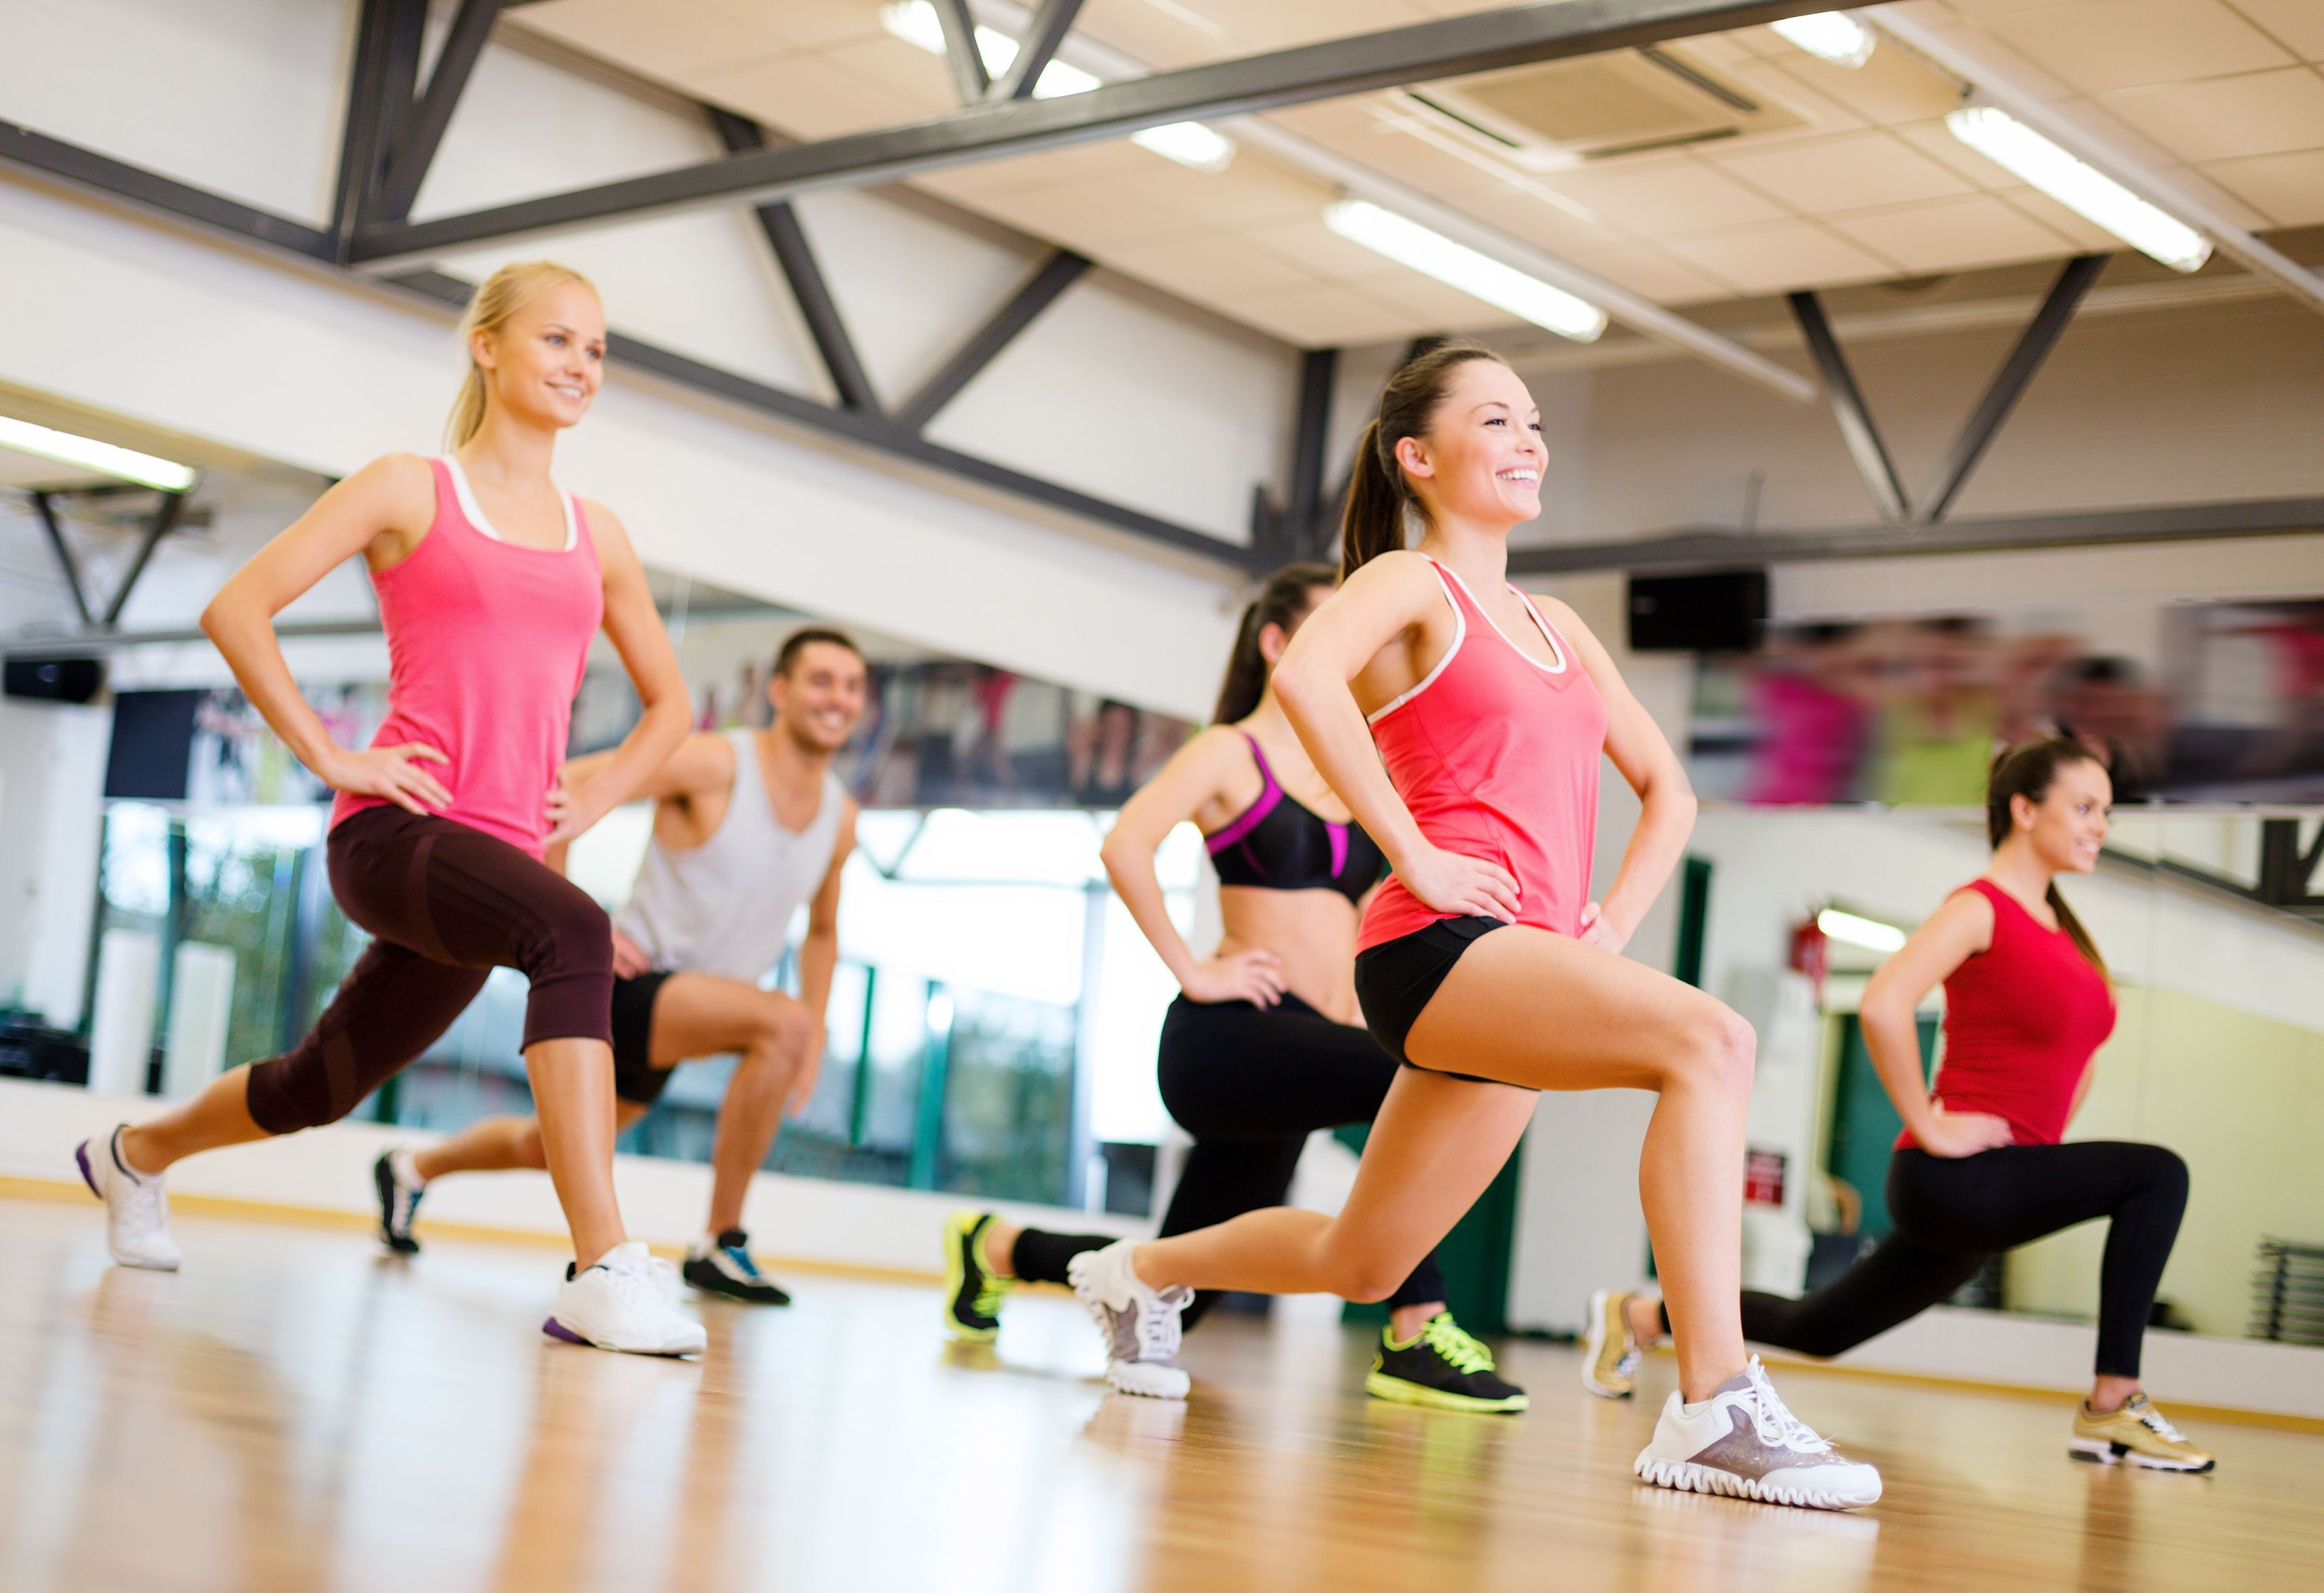 women training mistakes knee bends